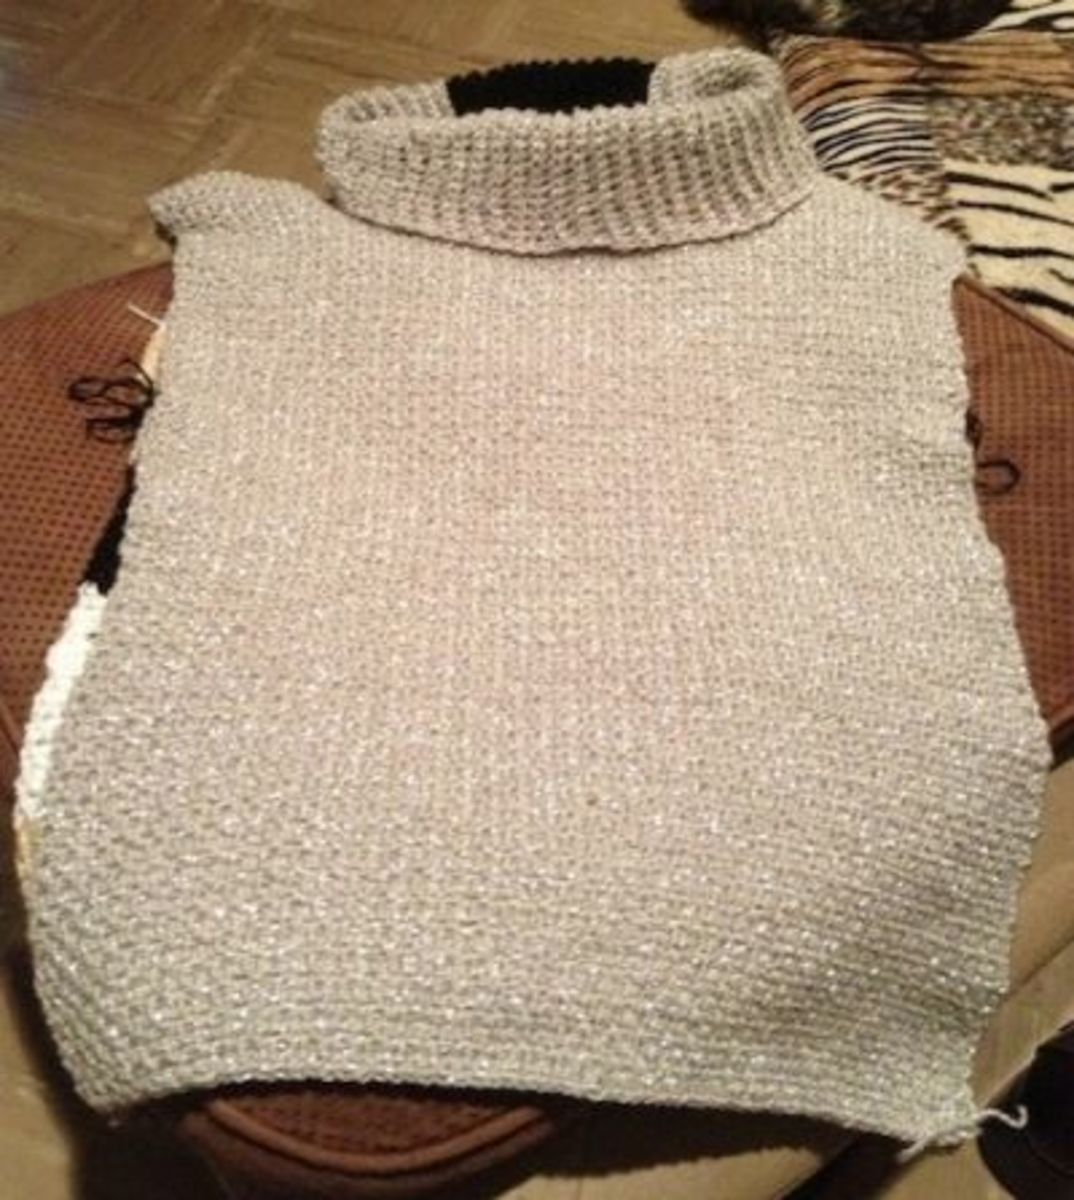 Custom Fit Sleeveless Reversible Turtleneck Sweater - Free Crochet Pattern! ...